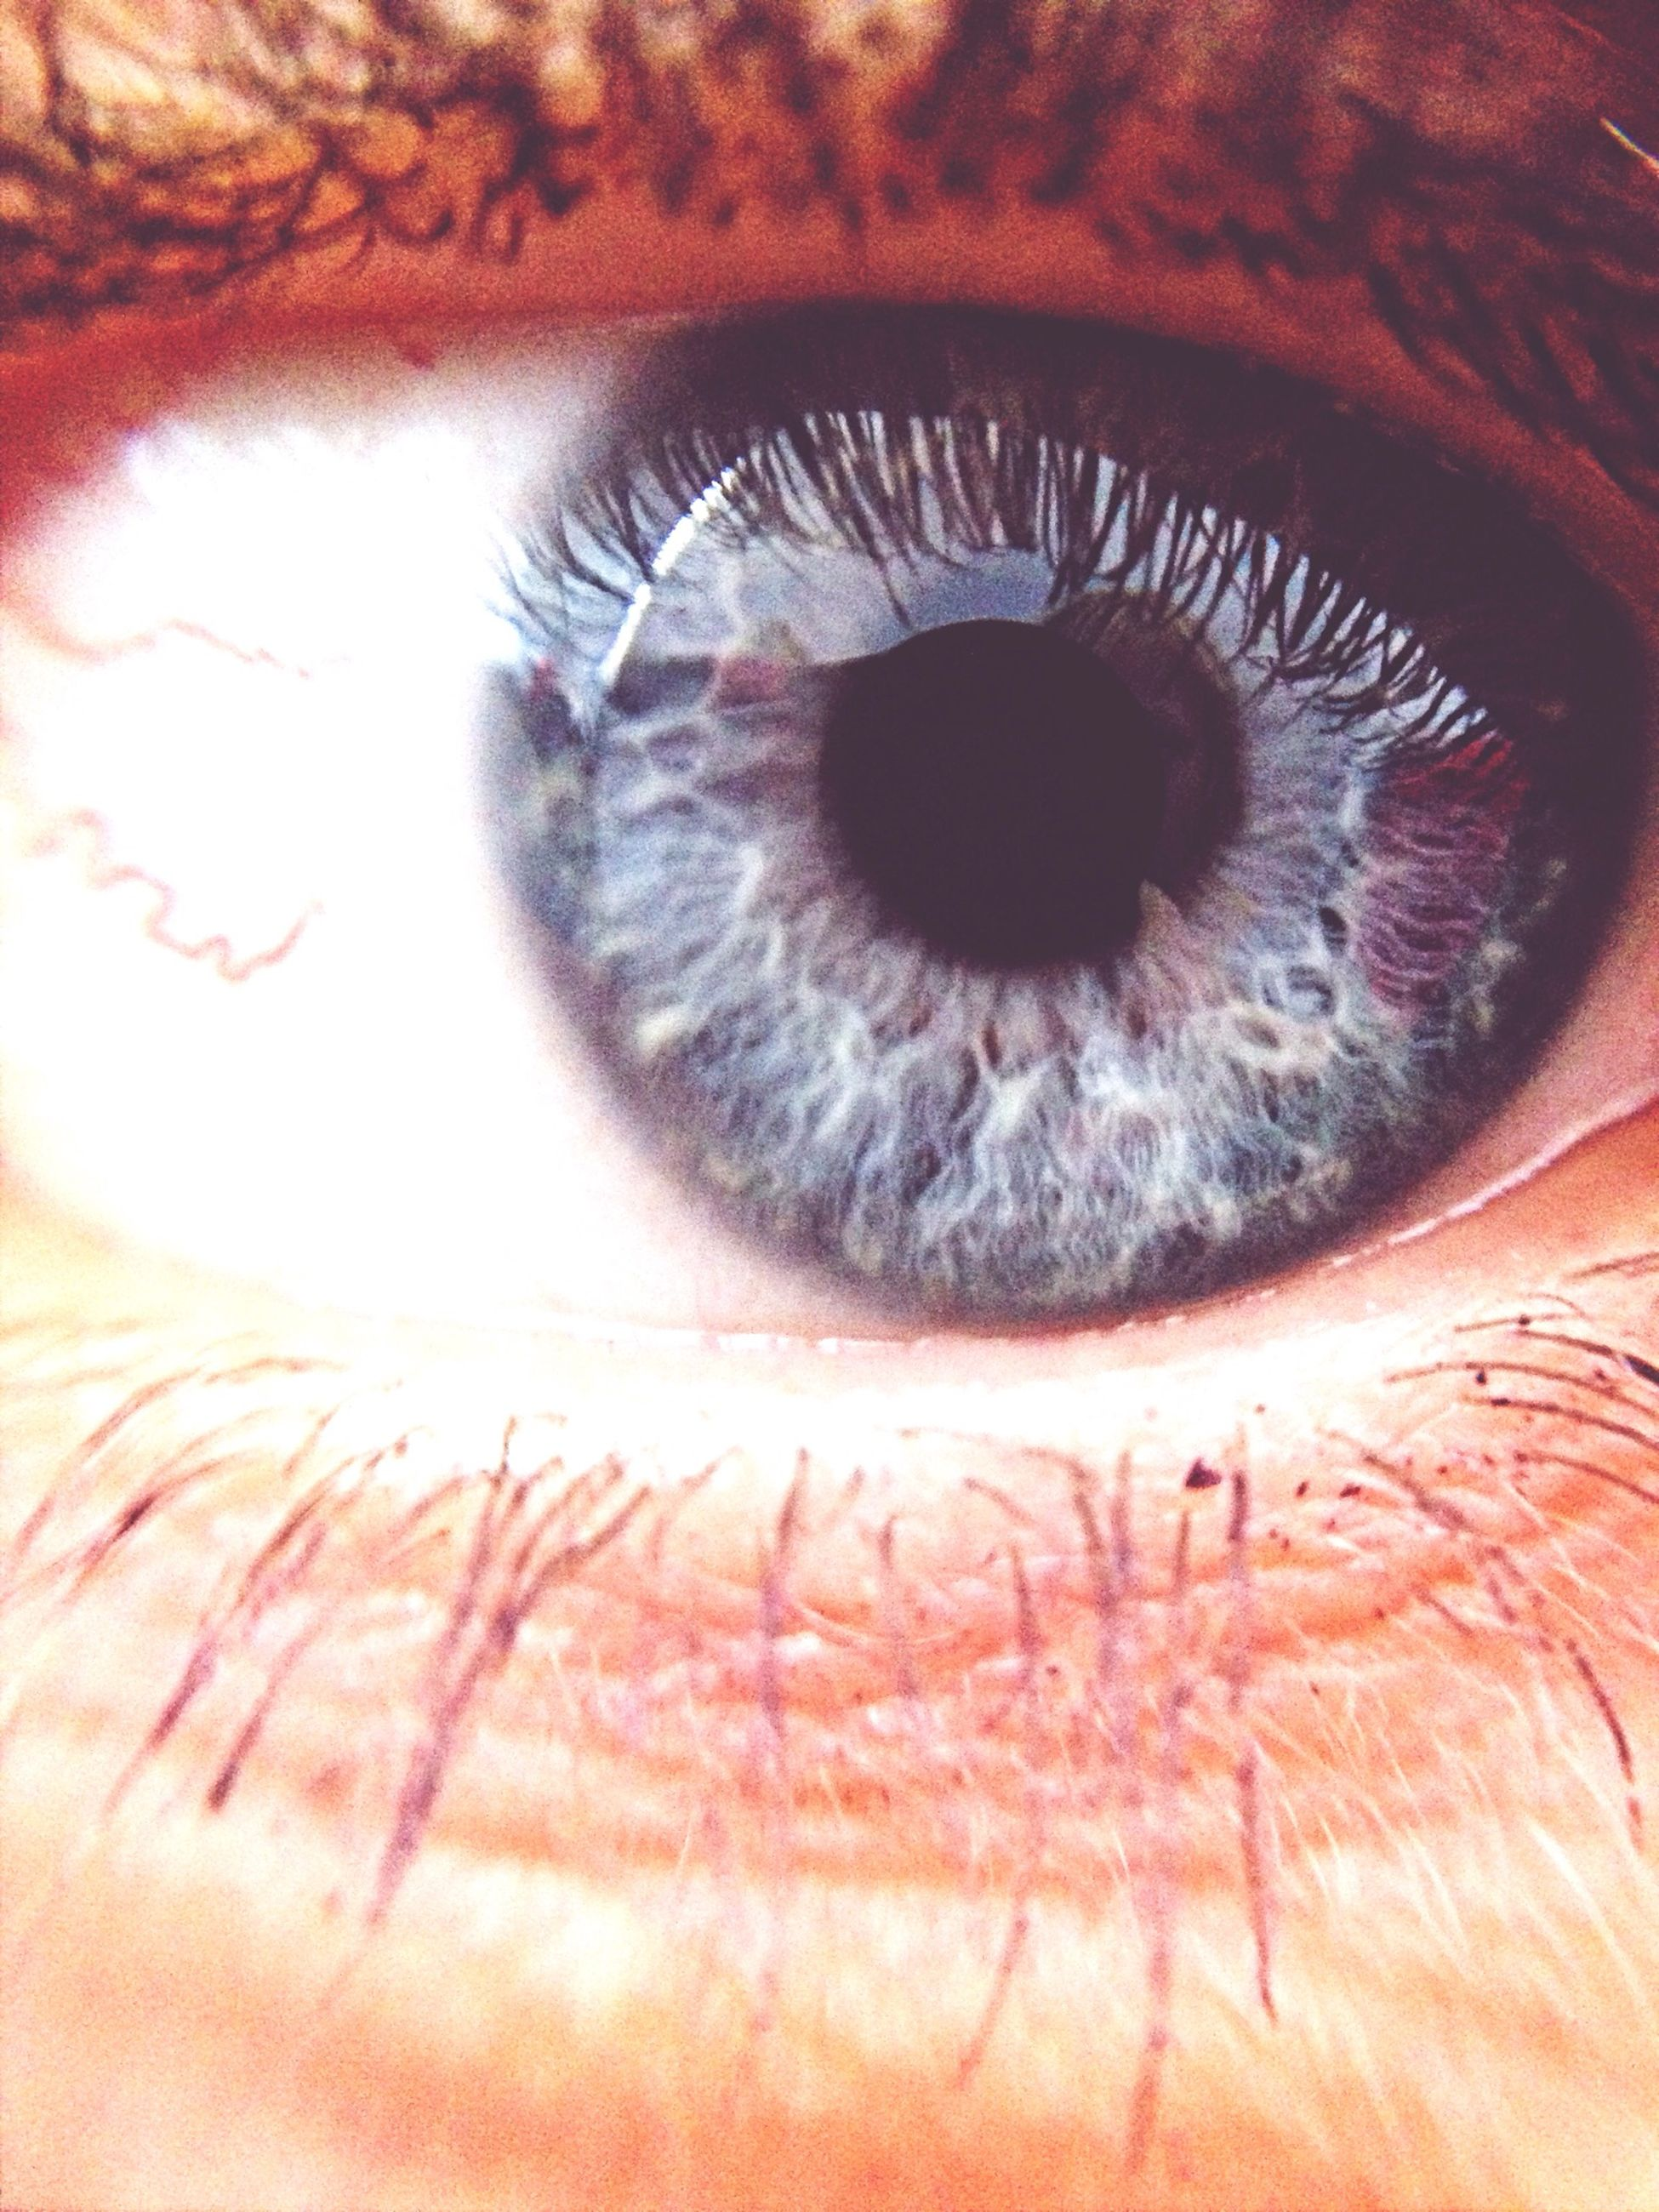 human eye, eyelash, eyesight, close-up, part of, sensory perception, human skin, eyeball, iris - eye, extreme close-up, unrecognizable person, extreme close up, indoors, looking at camera, human face, portrait, lifestyles